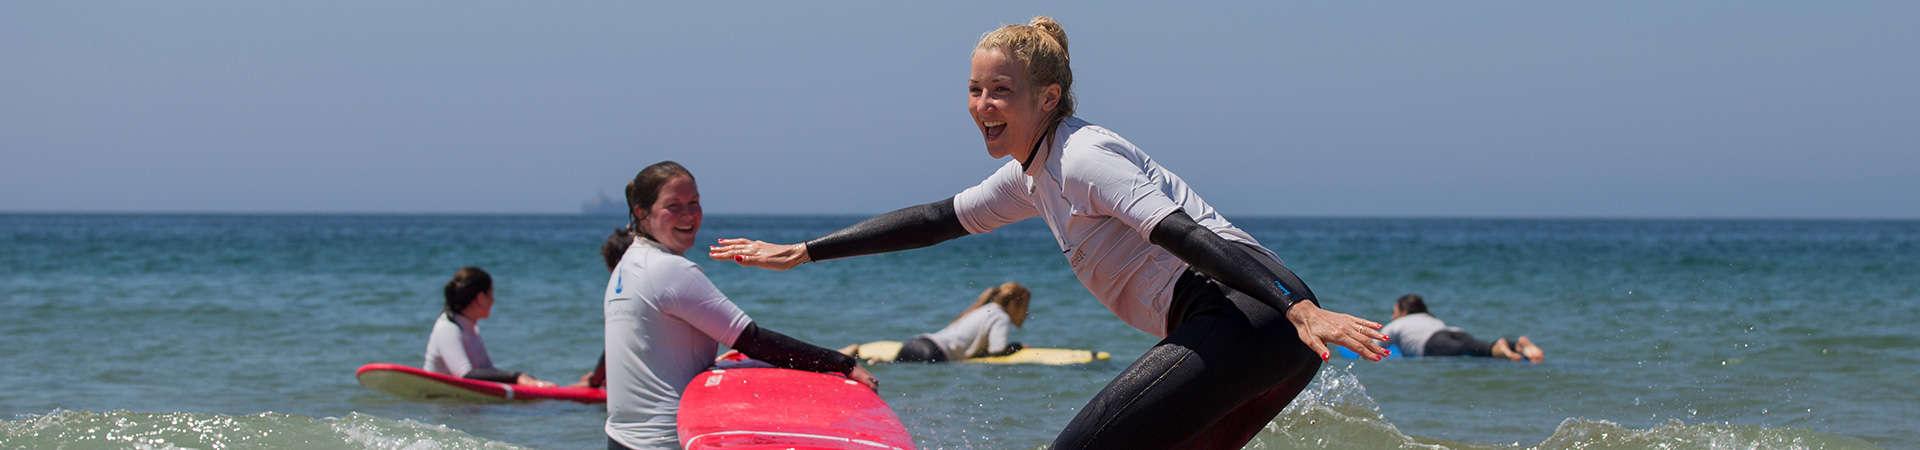 algarve surf lesson beginners